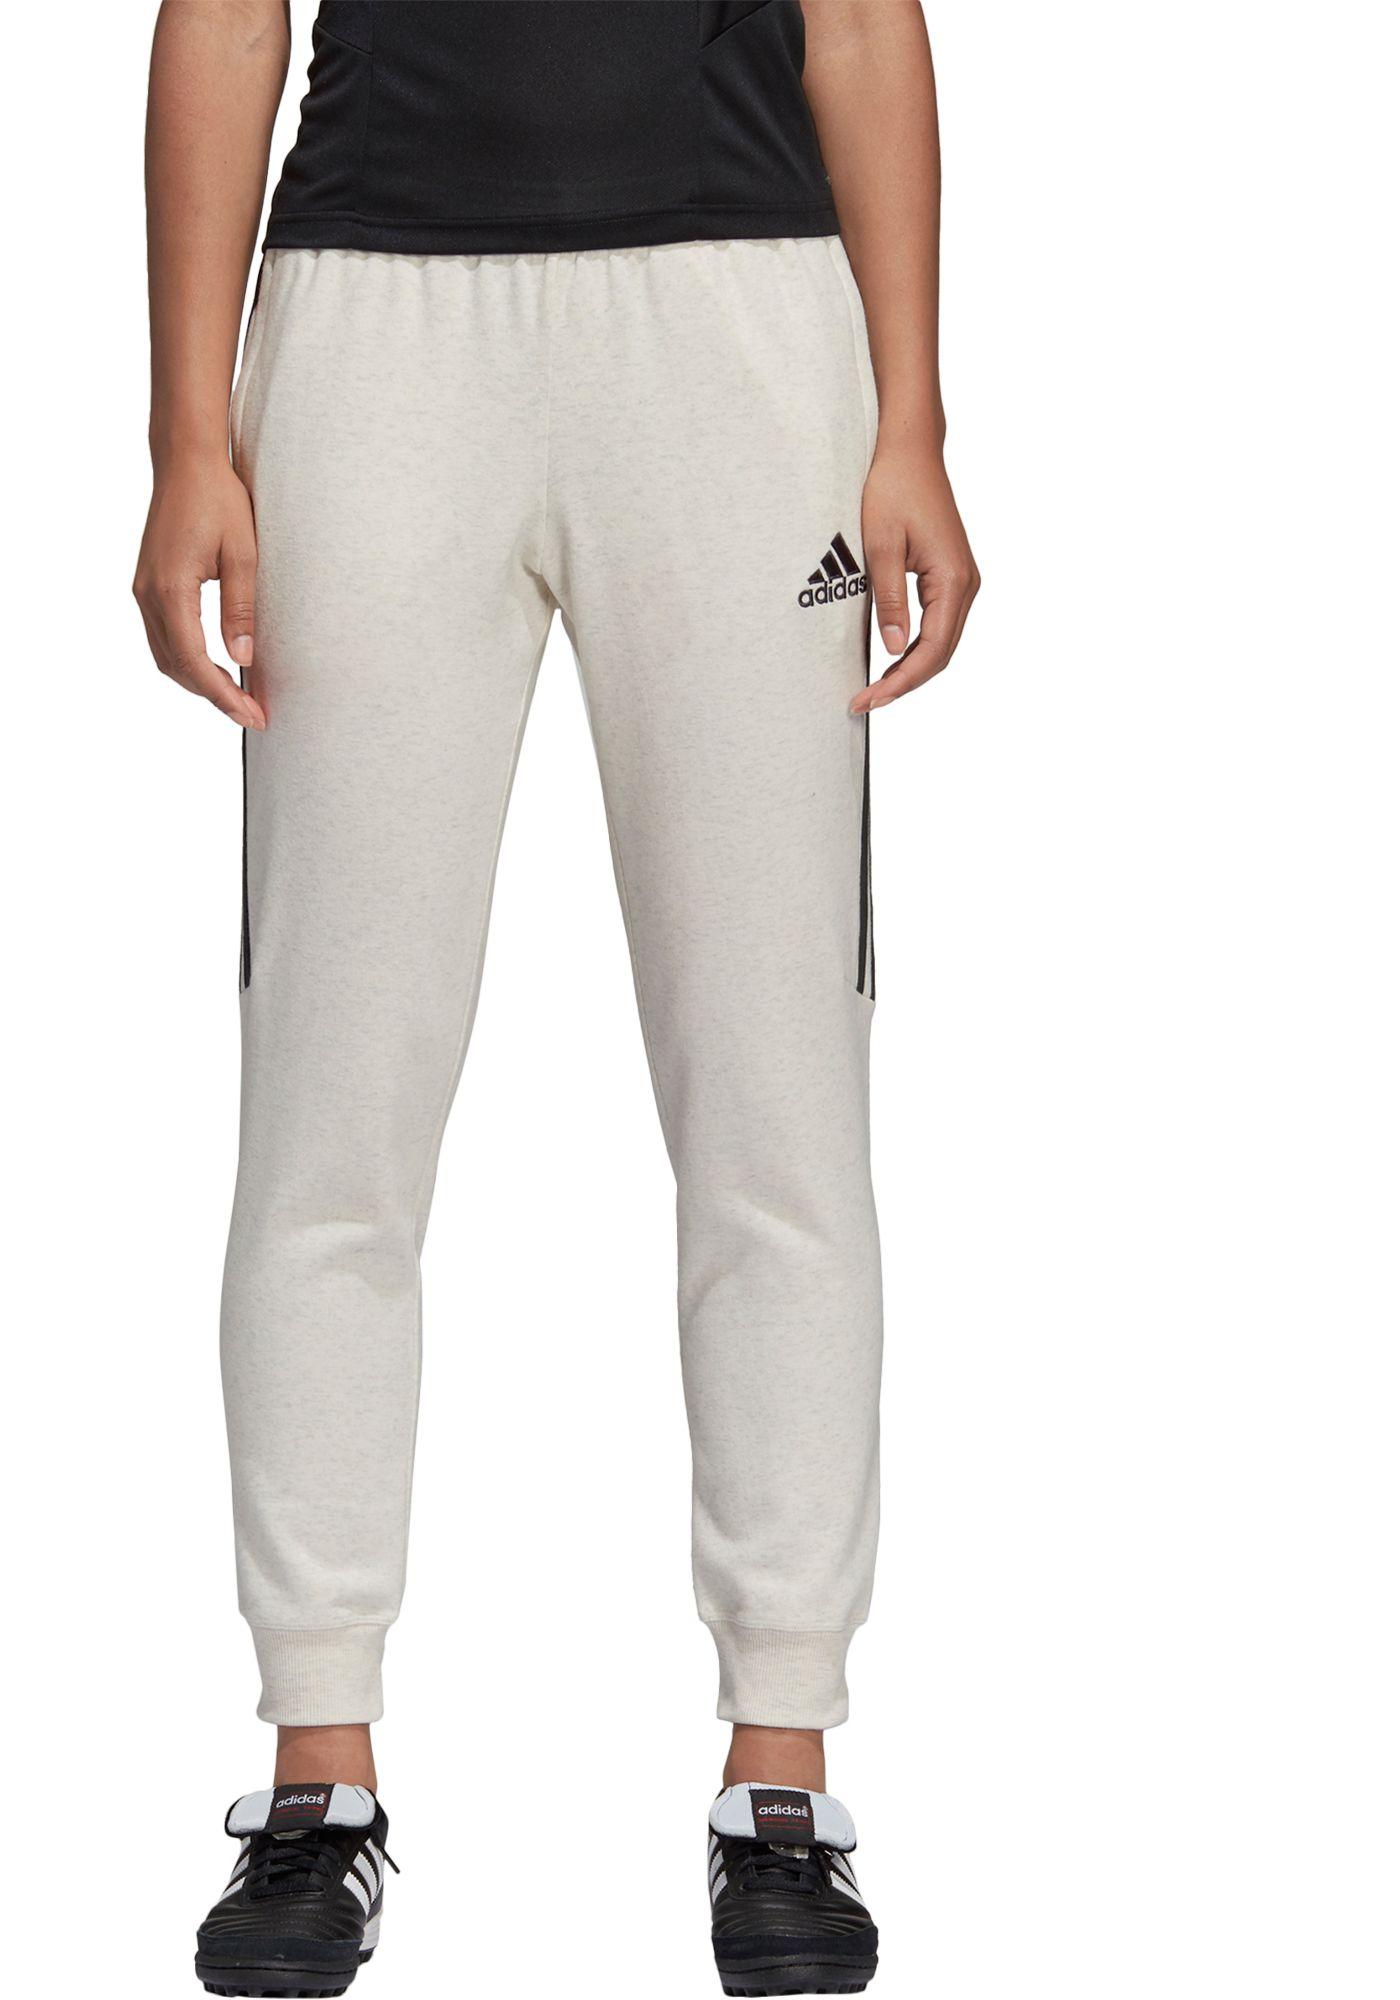 adidas Women's French Terry Tiro 18 Pants